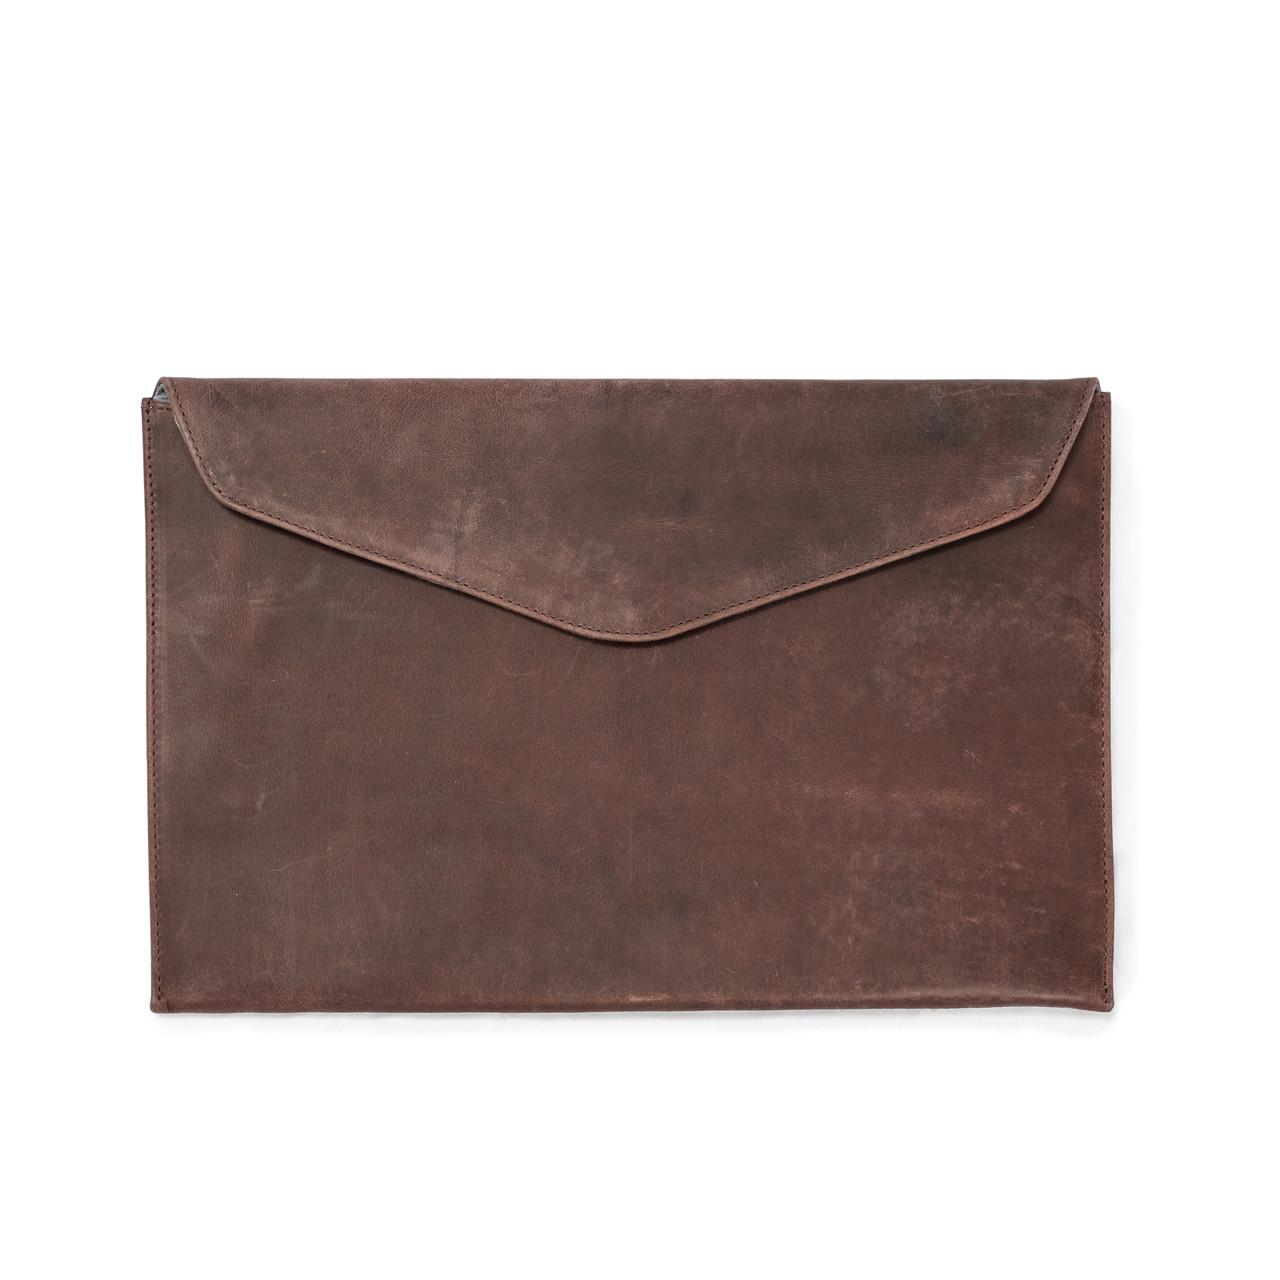 Burgundy Leather Laptop Case / Computer Sleeve